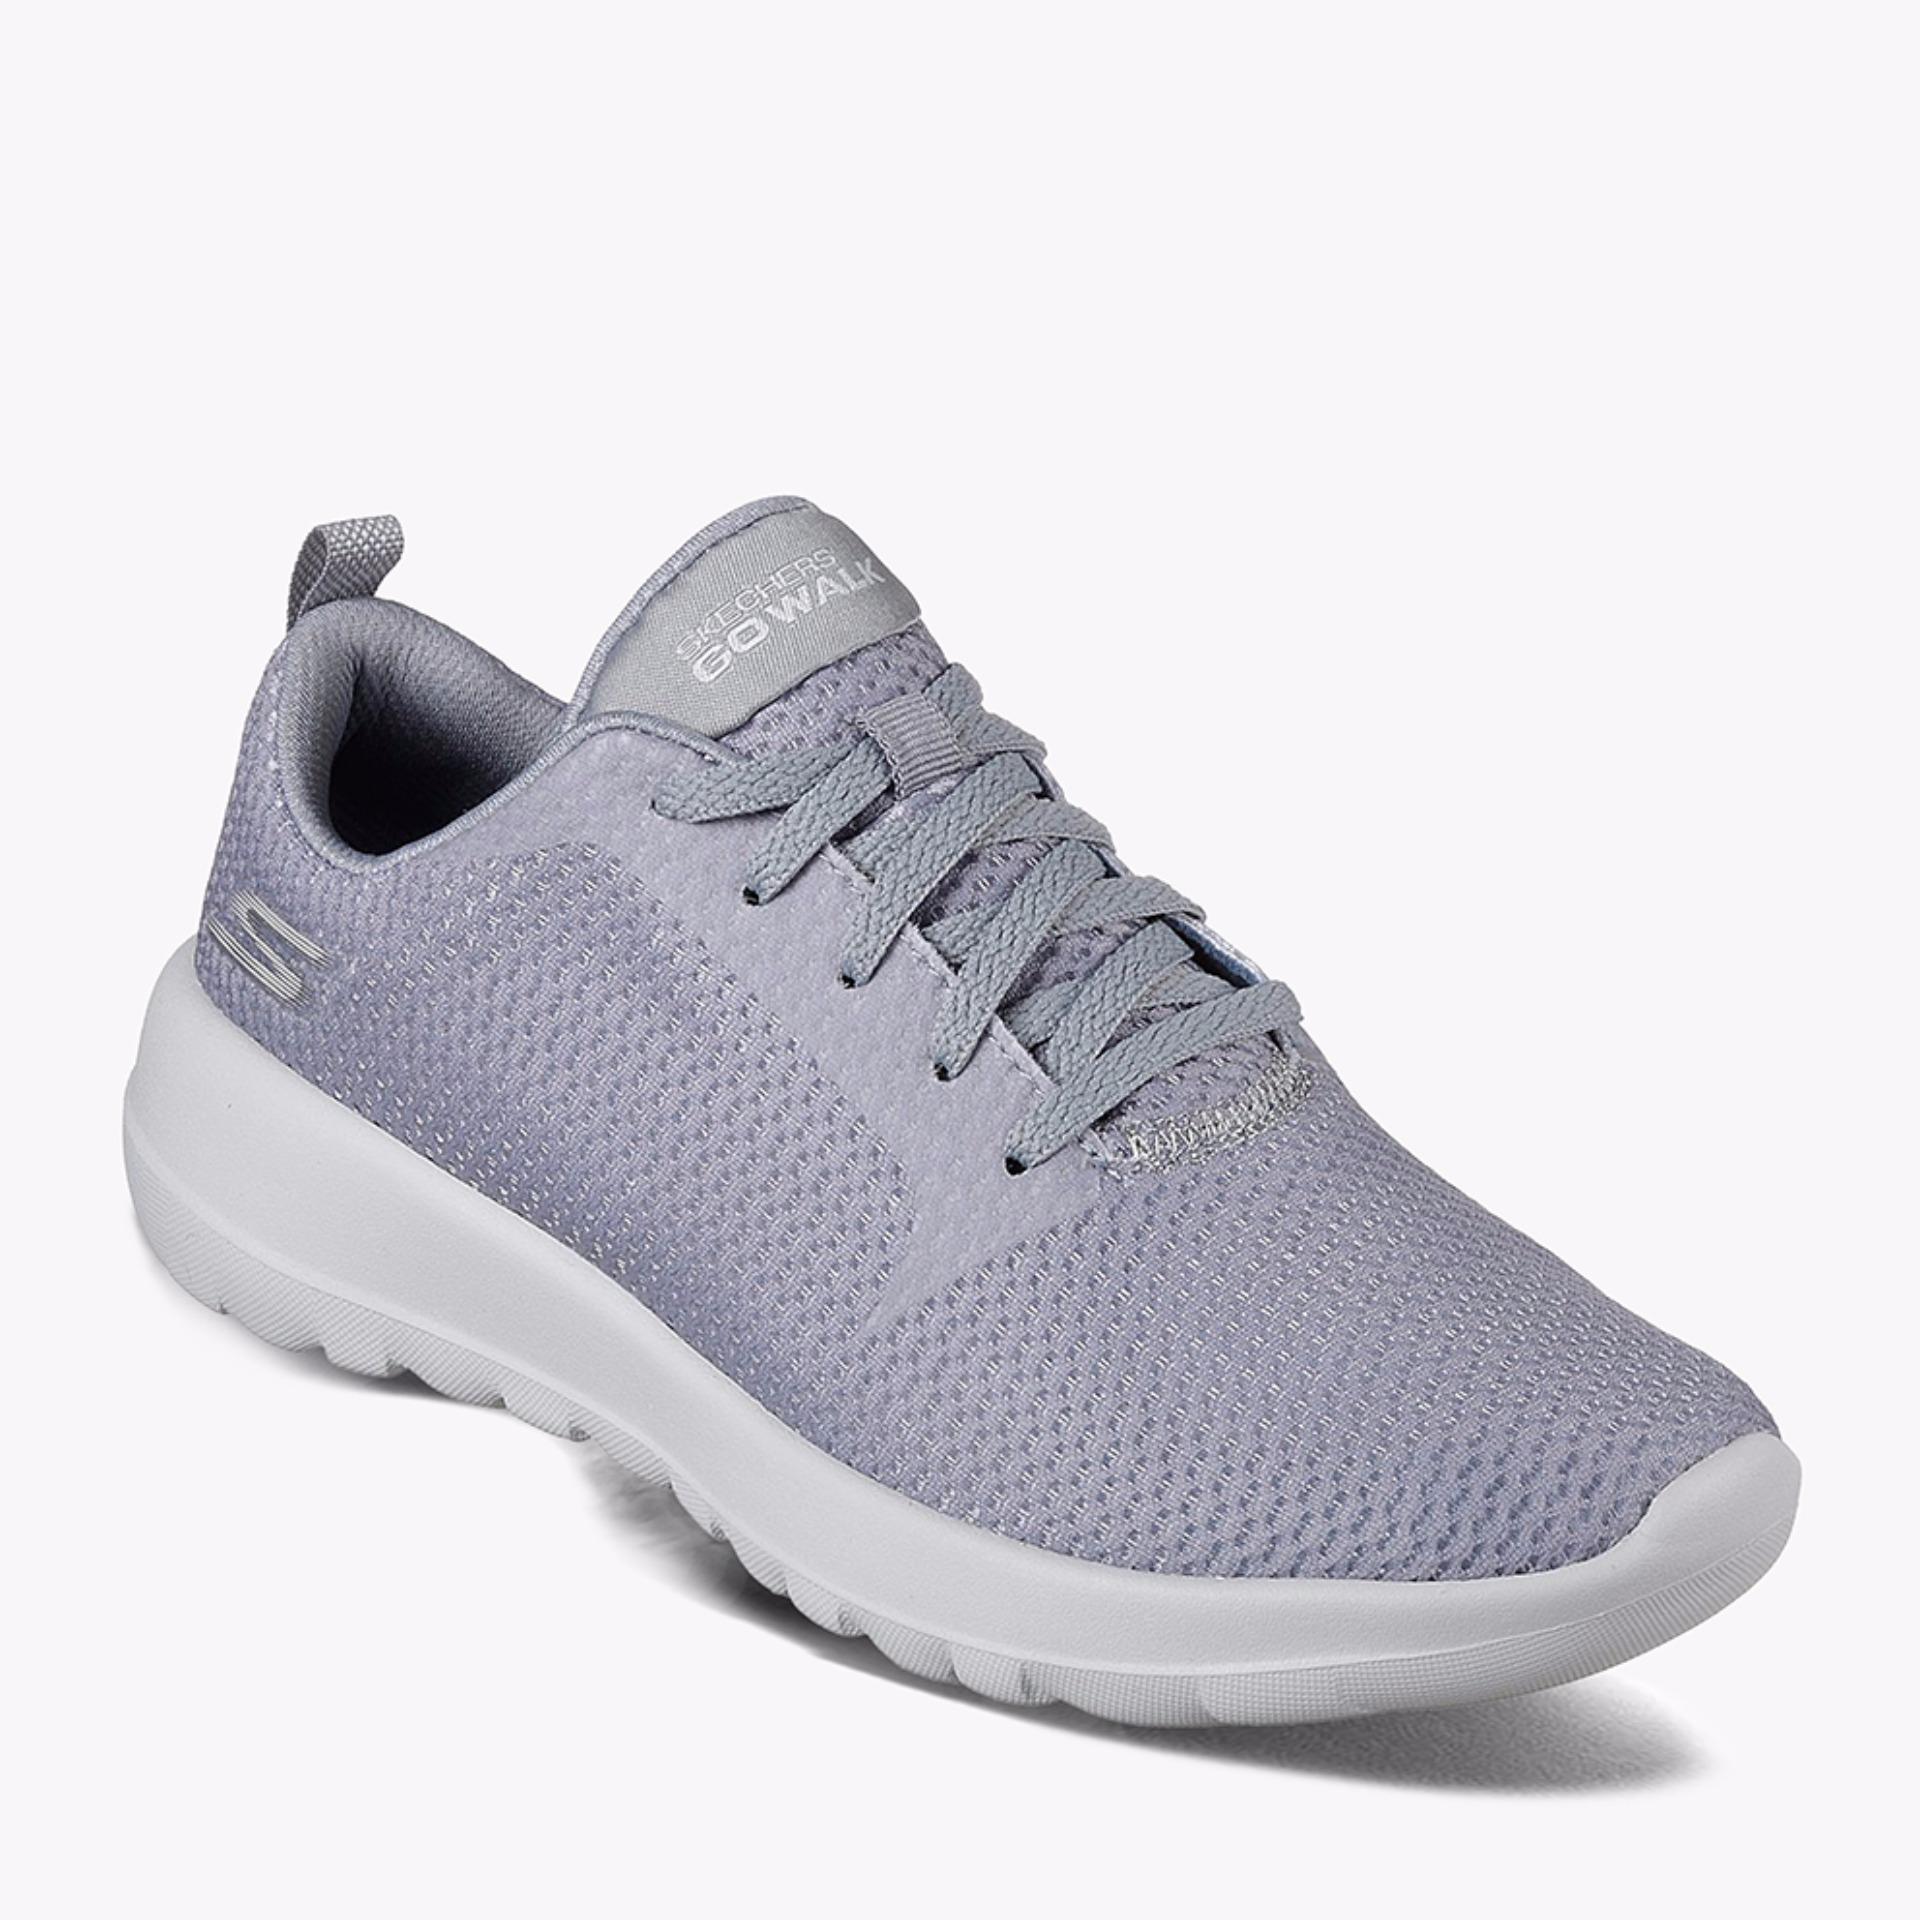 Spesifikasi Skechers Go Walk Joy Women S Sneakers Shoes Charcoal Baru